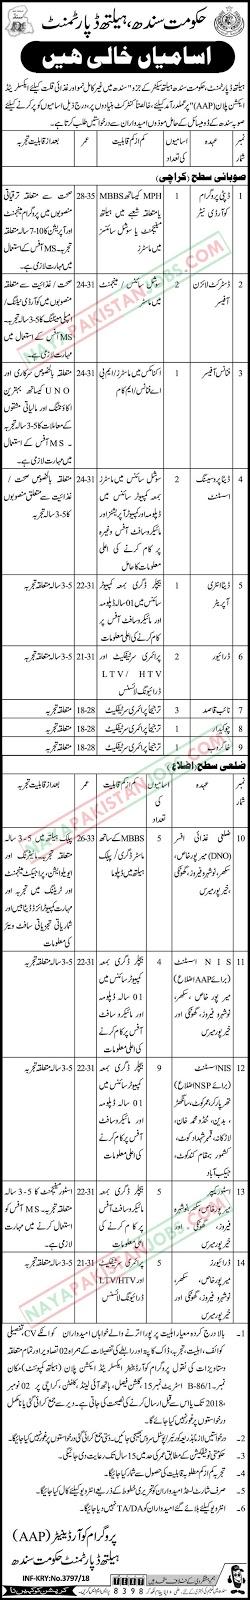 Latest Vacancies Announced in Health Department Govt of Sindh 24 October 2018 - Naya Pakistan